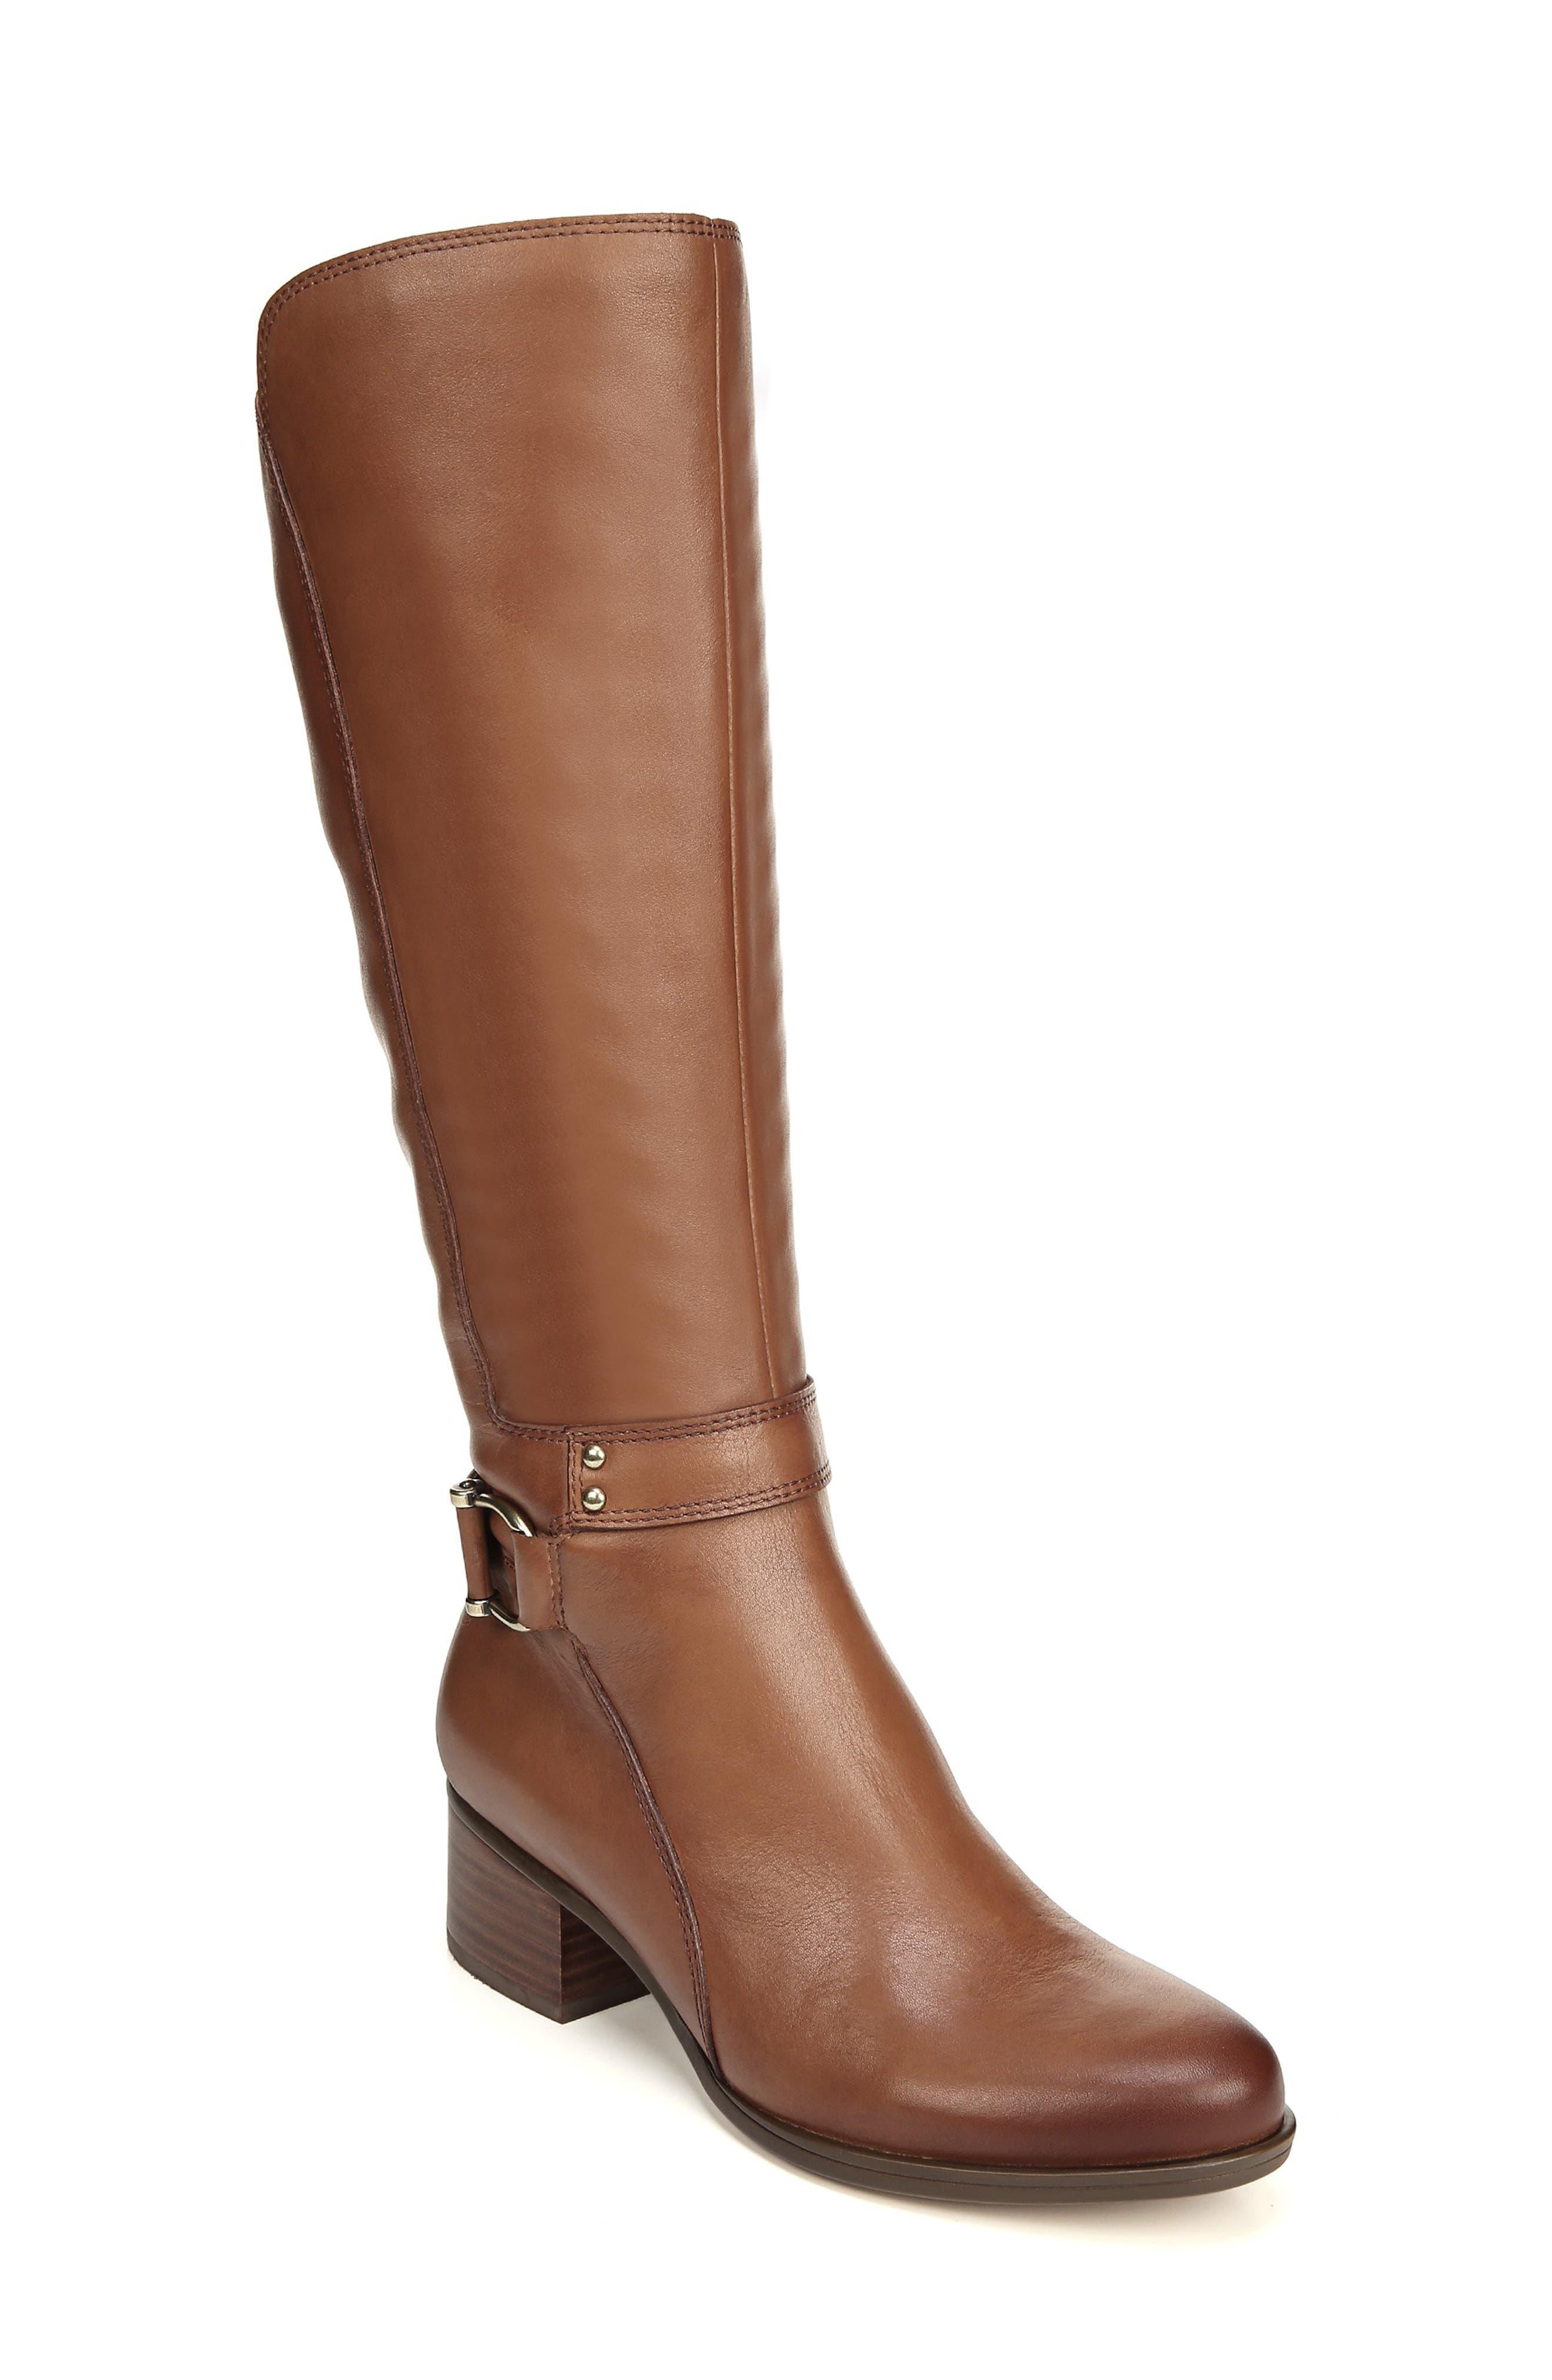 Naturalizer Dane Knee High Riding Boot, Wide Calf W - Brown